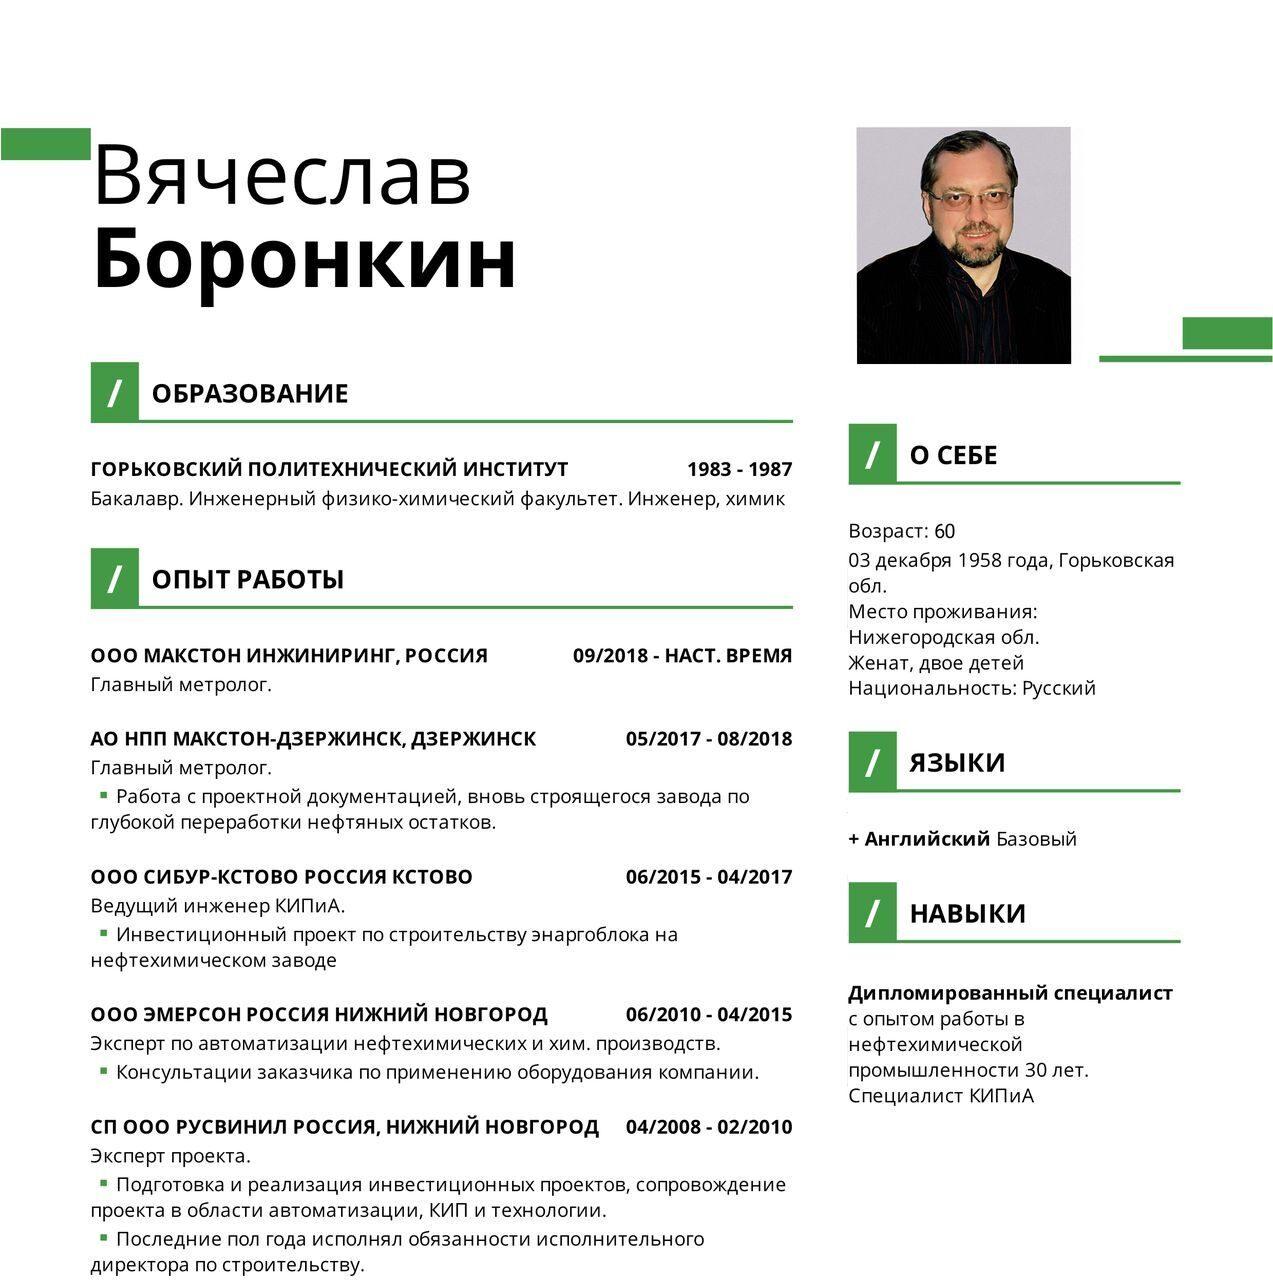 Вячеслав Боронкин 1 половина без контактов